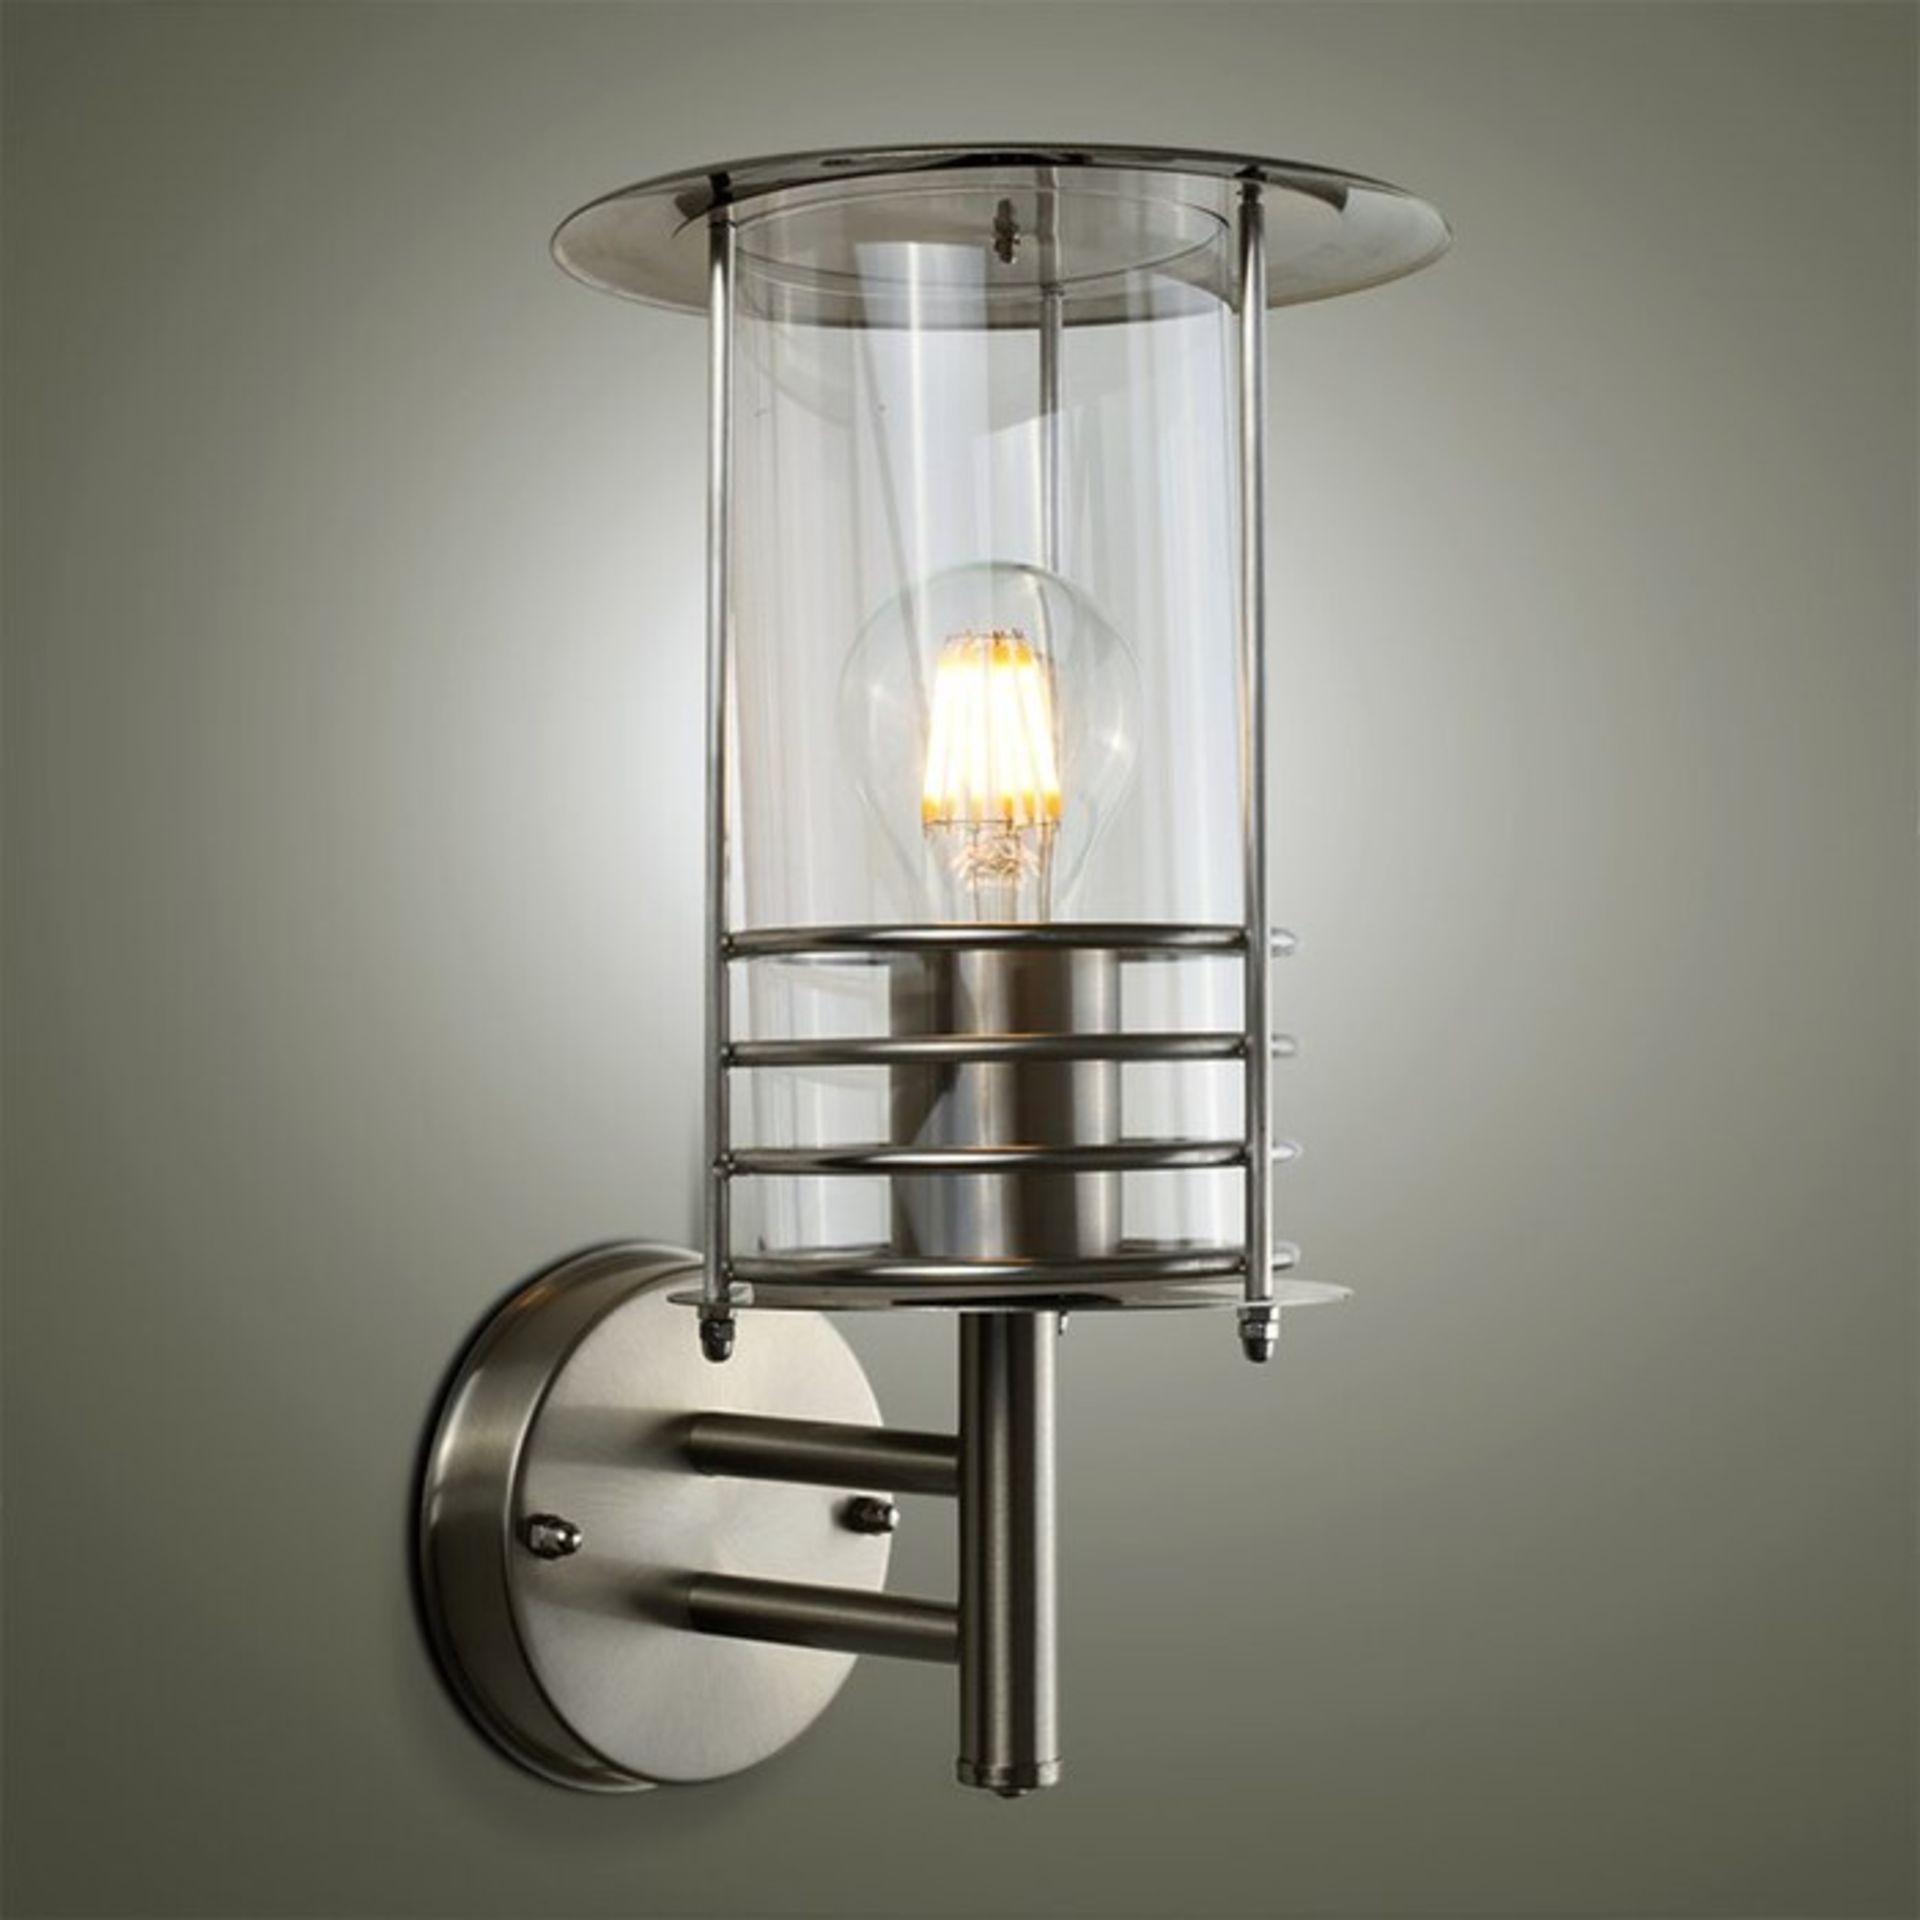 MiniSun, Dorset Outdoor Wall Lantern X3 (BULBS NOT INC)(SCRATCH ON ON GLASS ON ONE) - RRP£28.99 (